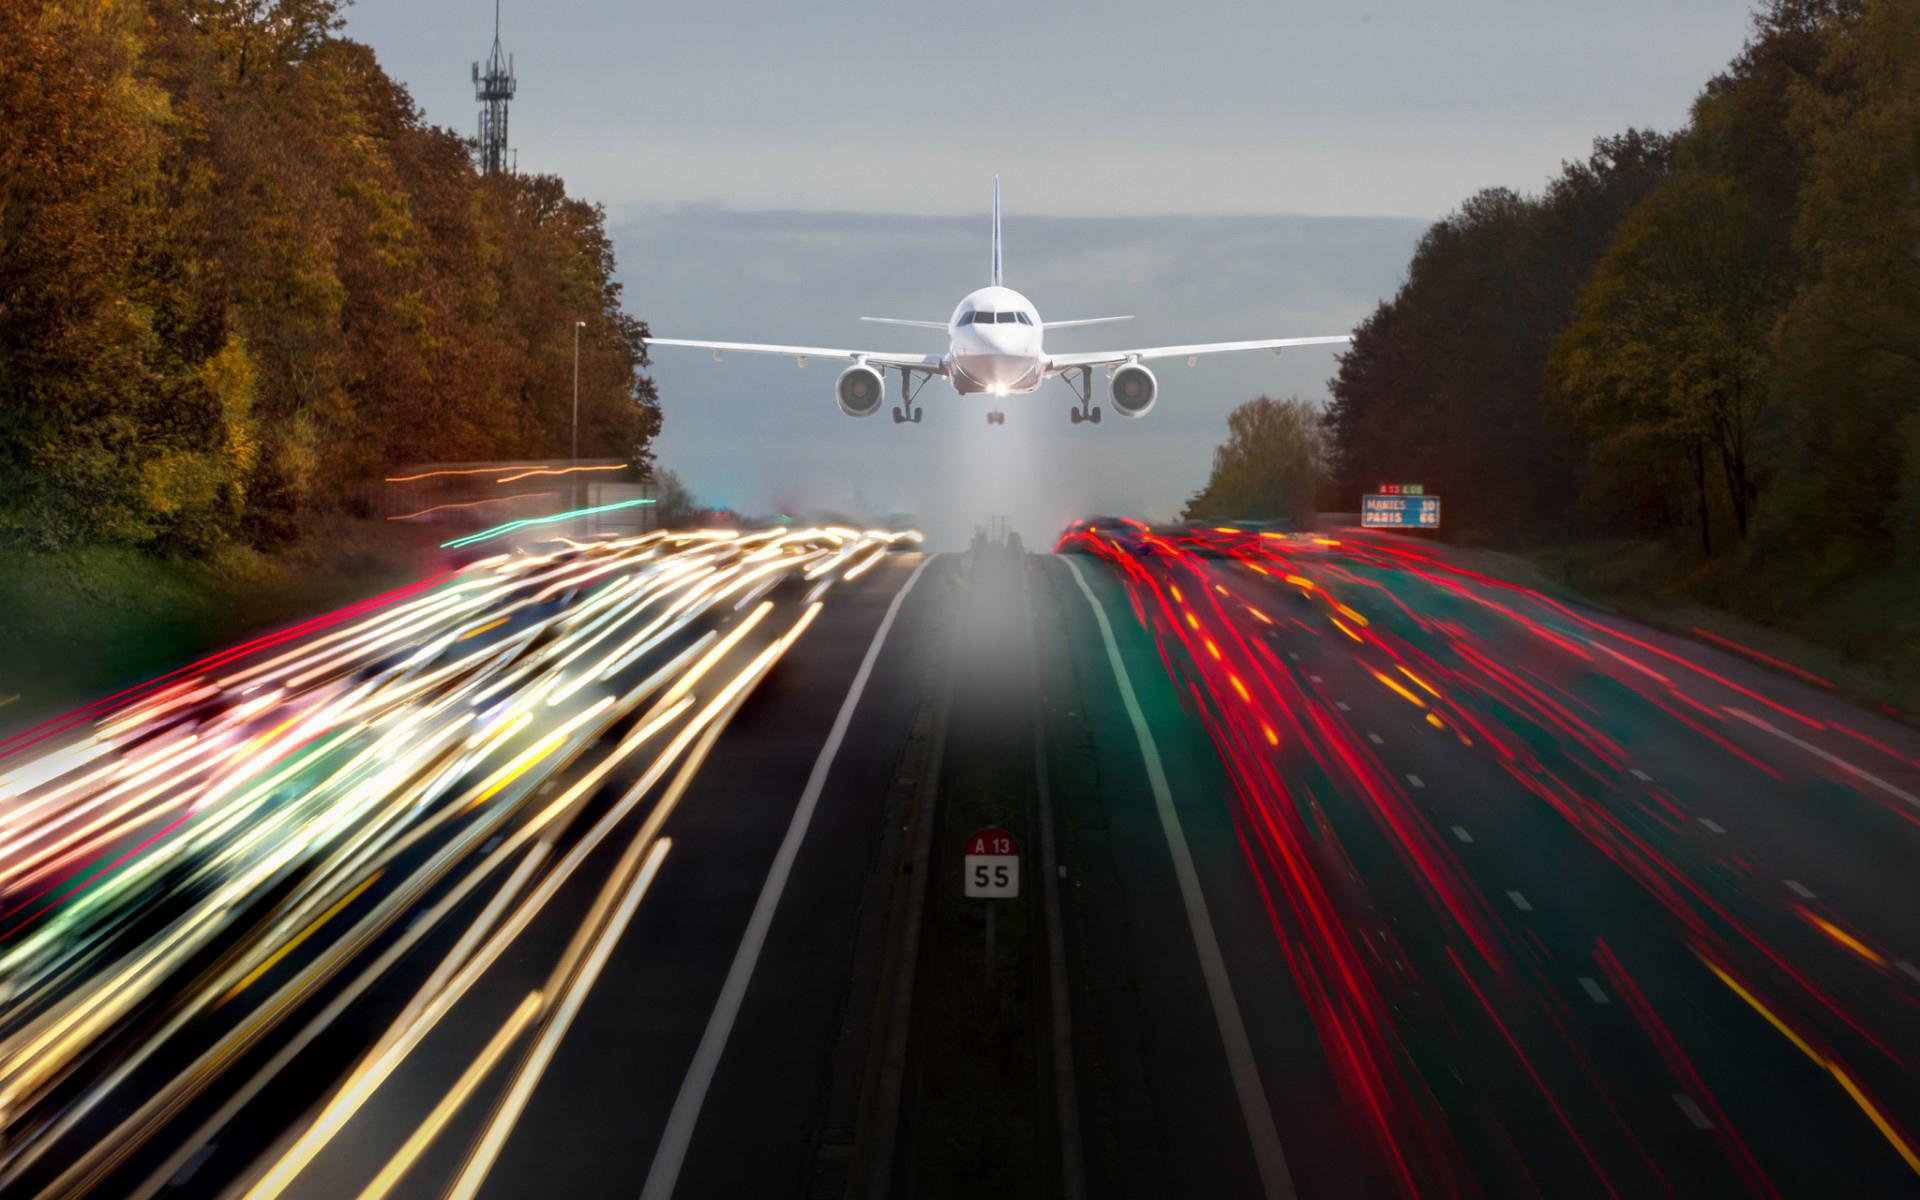 Vehicles - Airplane  Wallpaper